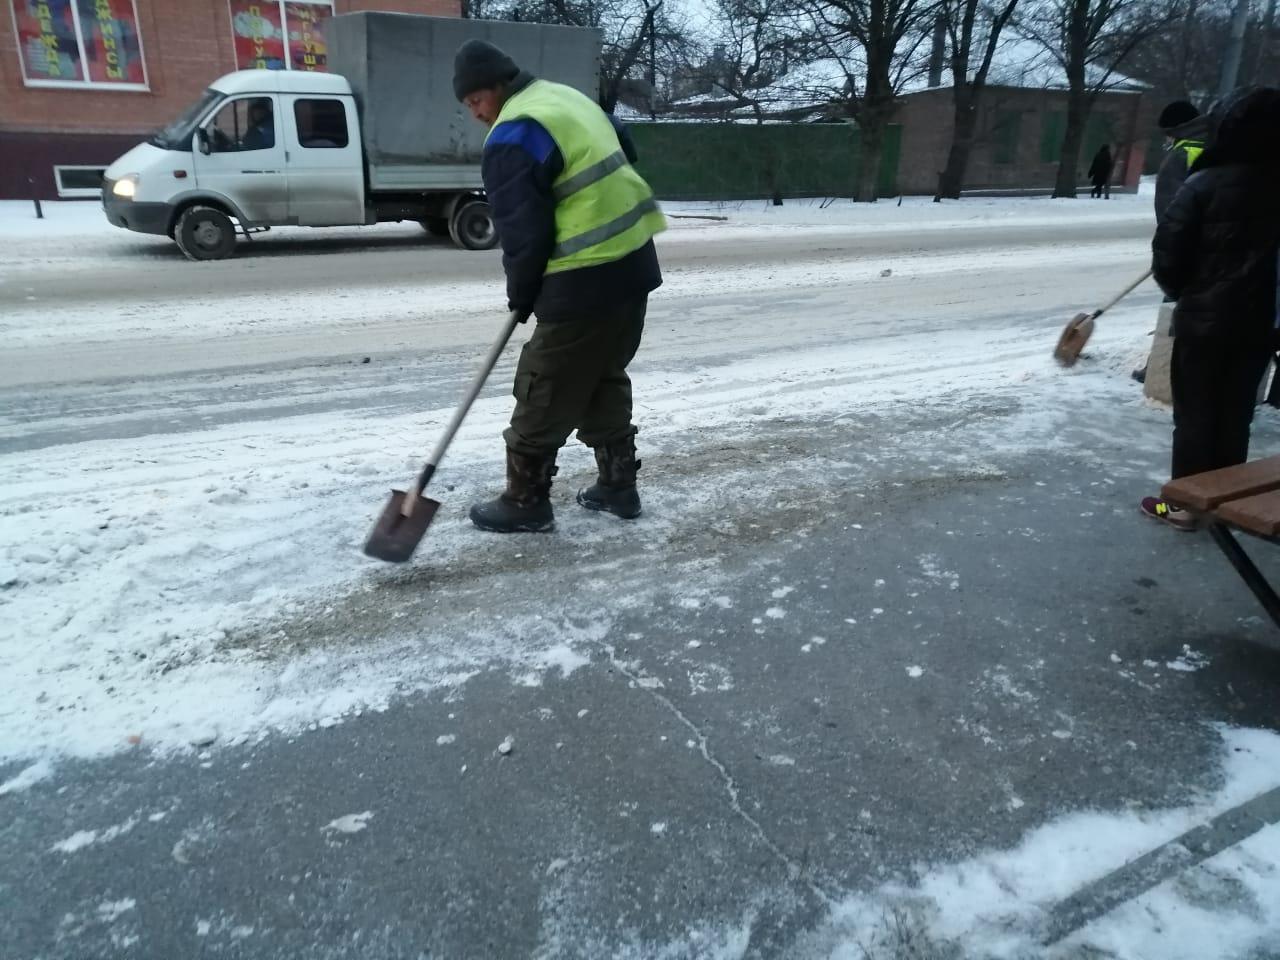 МКУ «Благоустрйоство»: 20 единиц спецтехники работает на улицах Таганрога